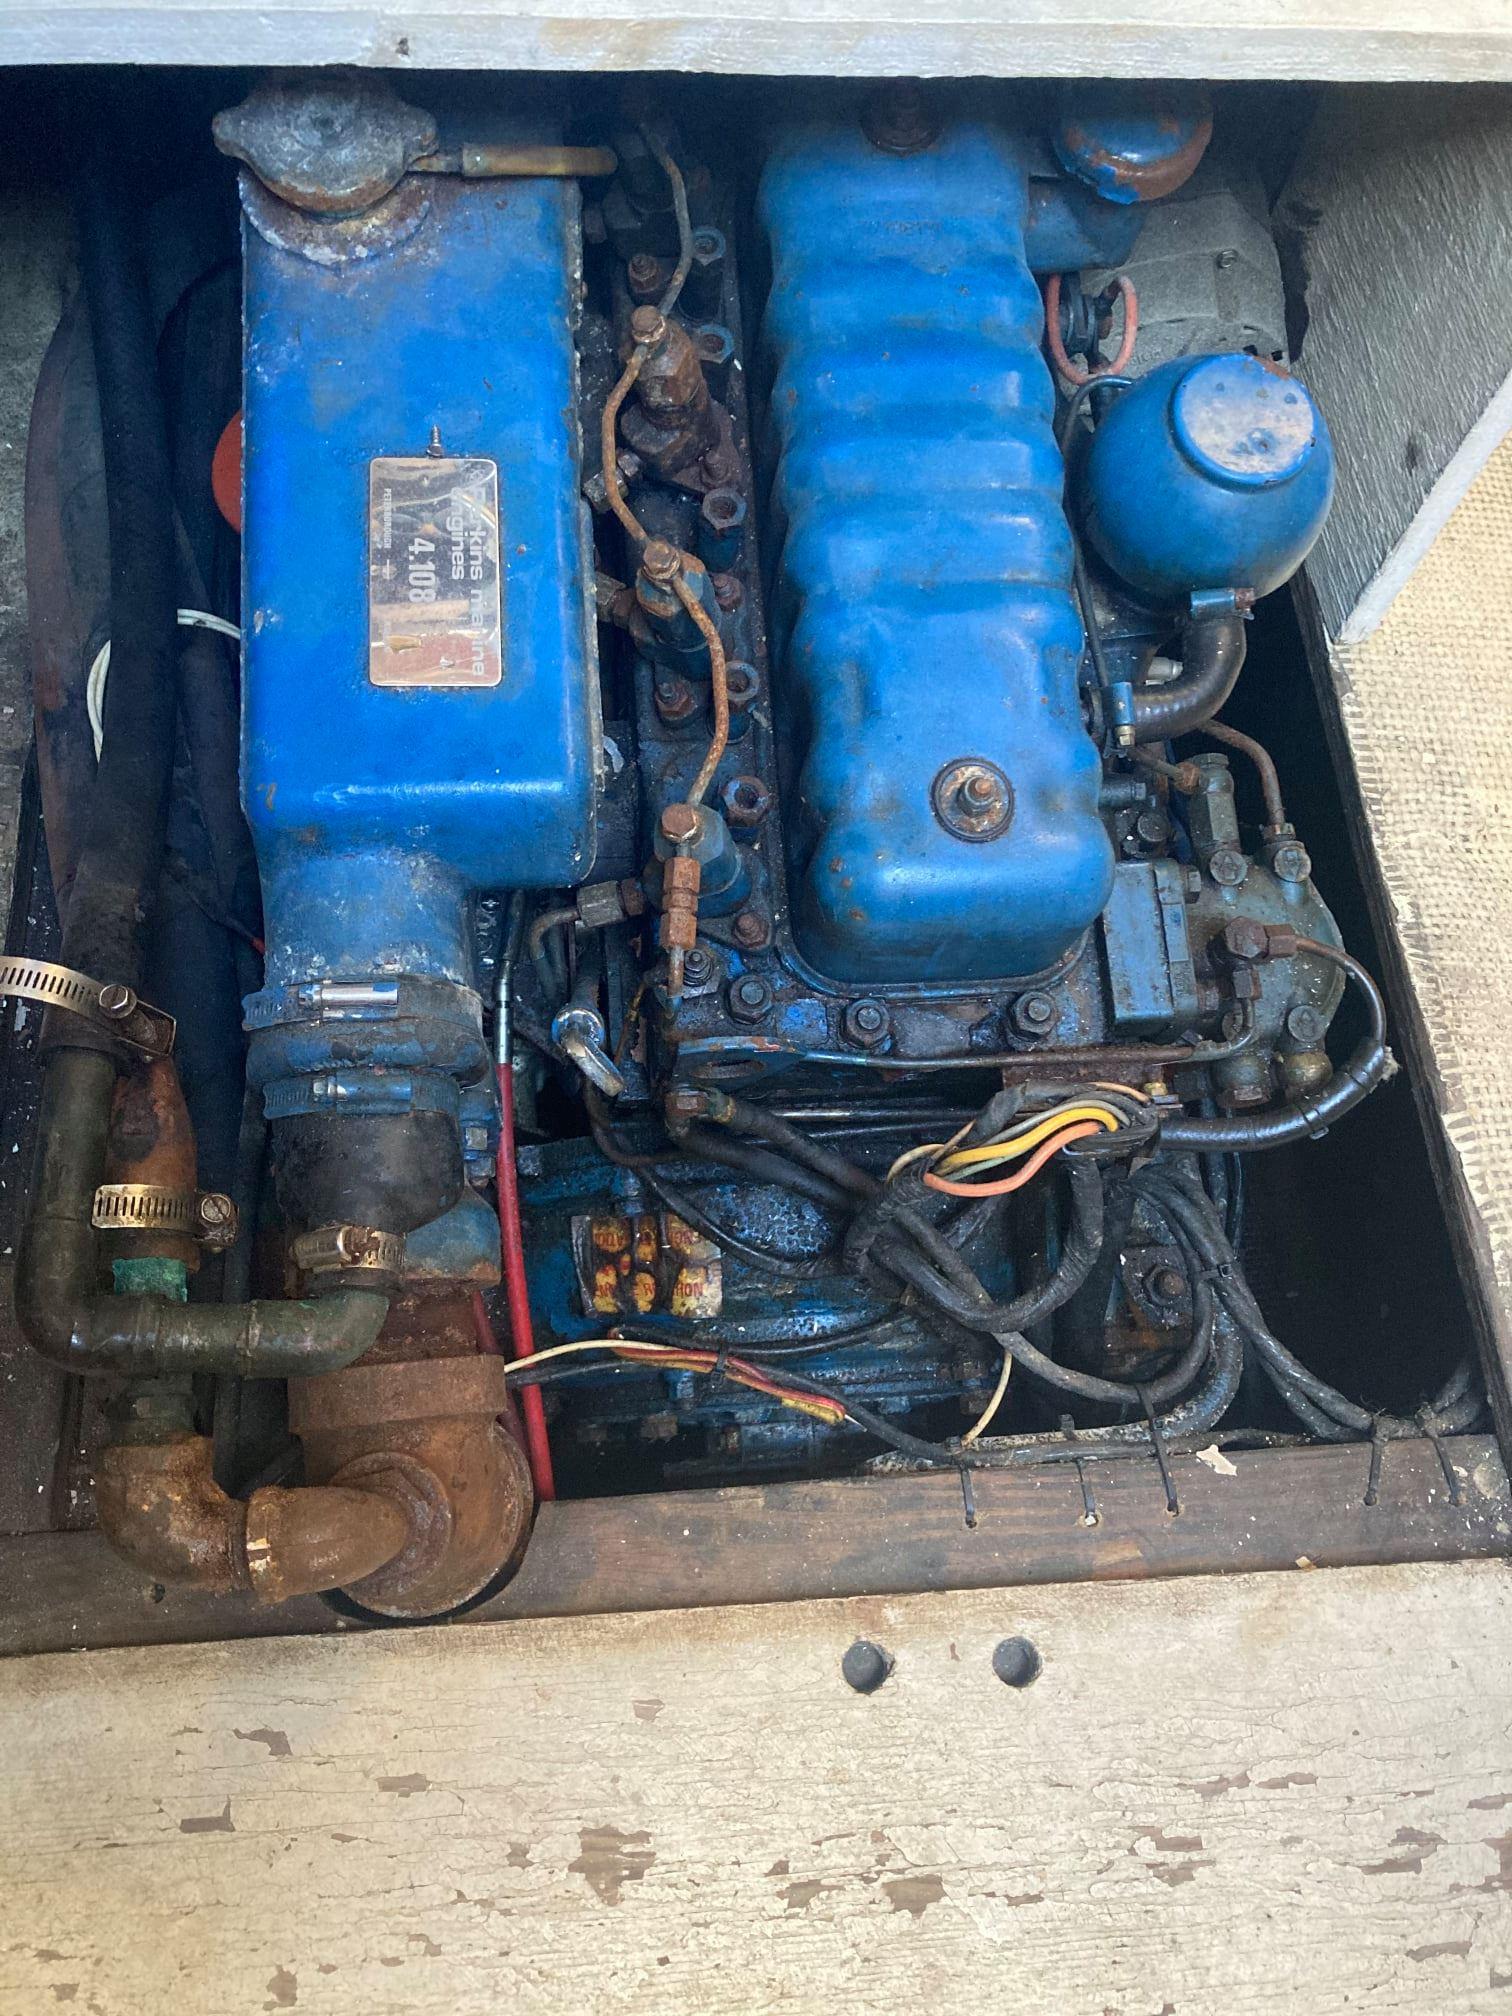 057 - Fire Lake - engine